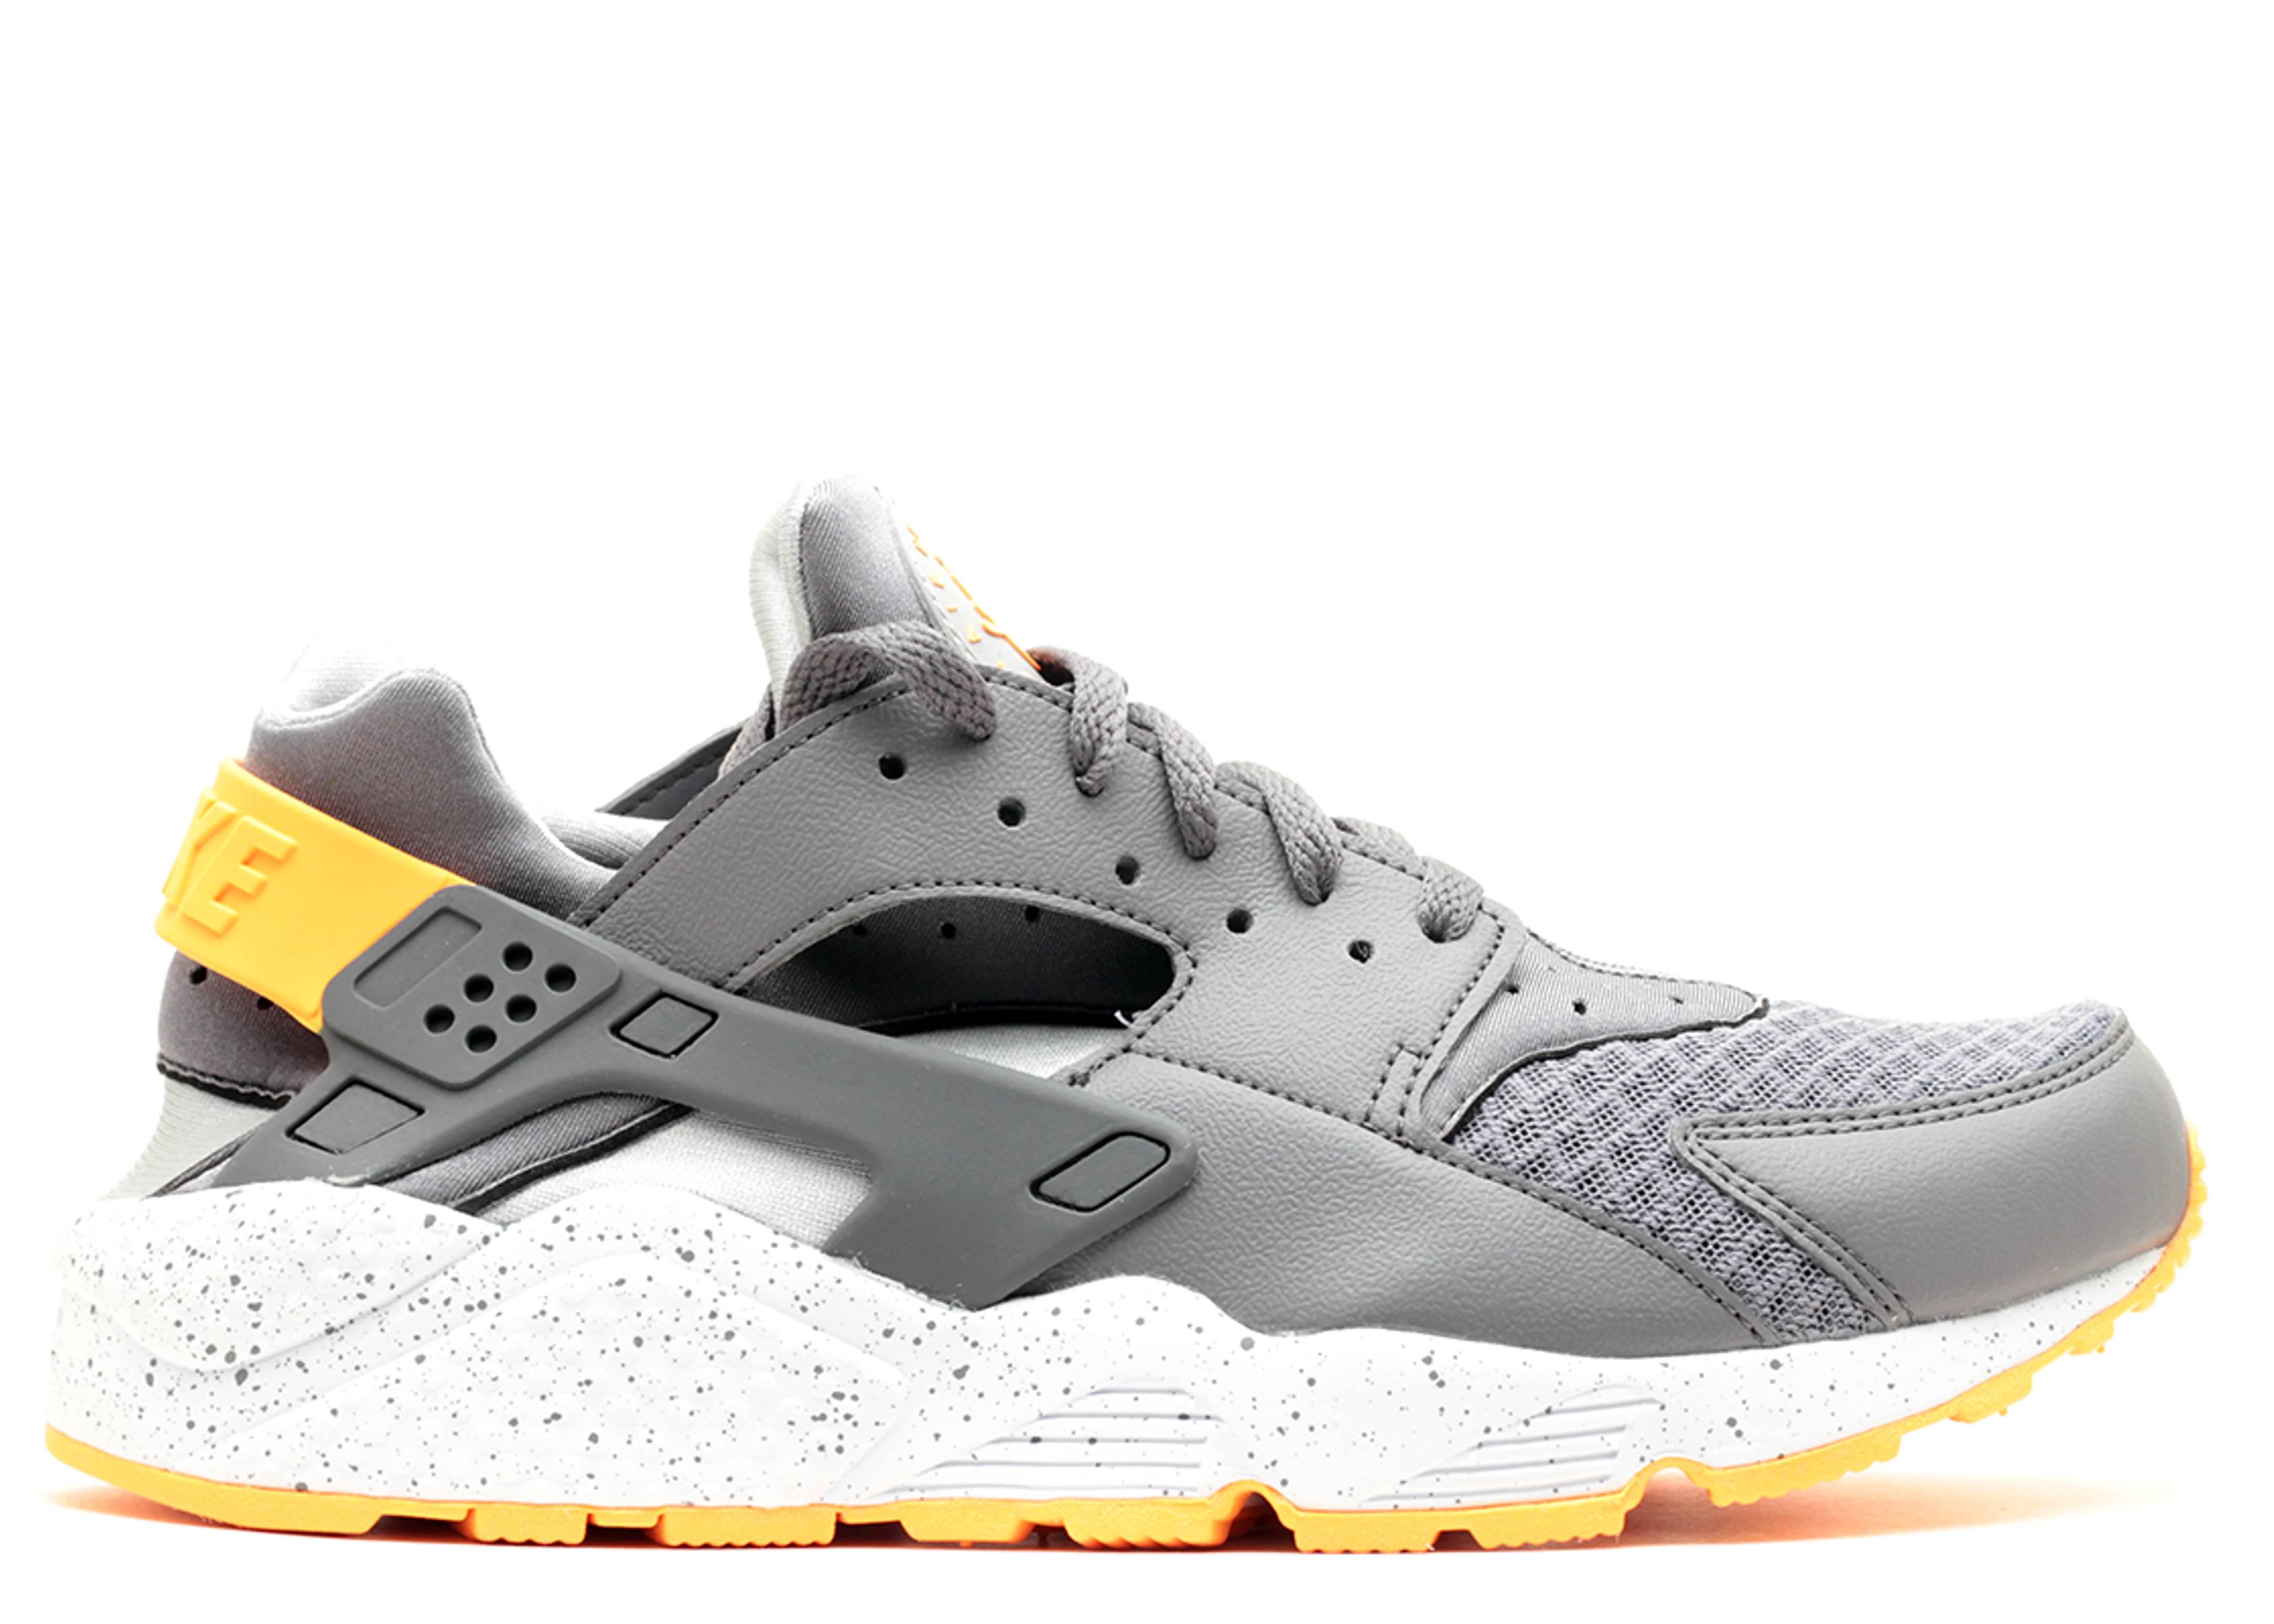 Nike Air Huarache Shoes Cool Grey